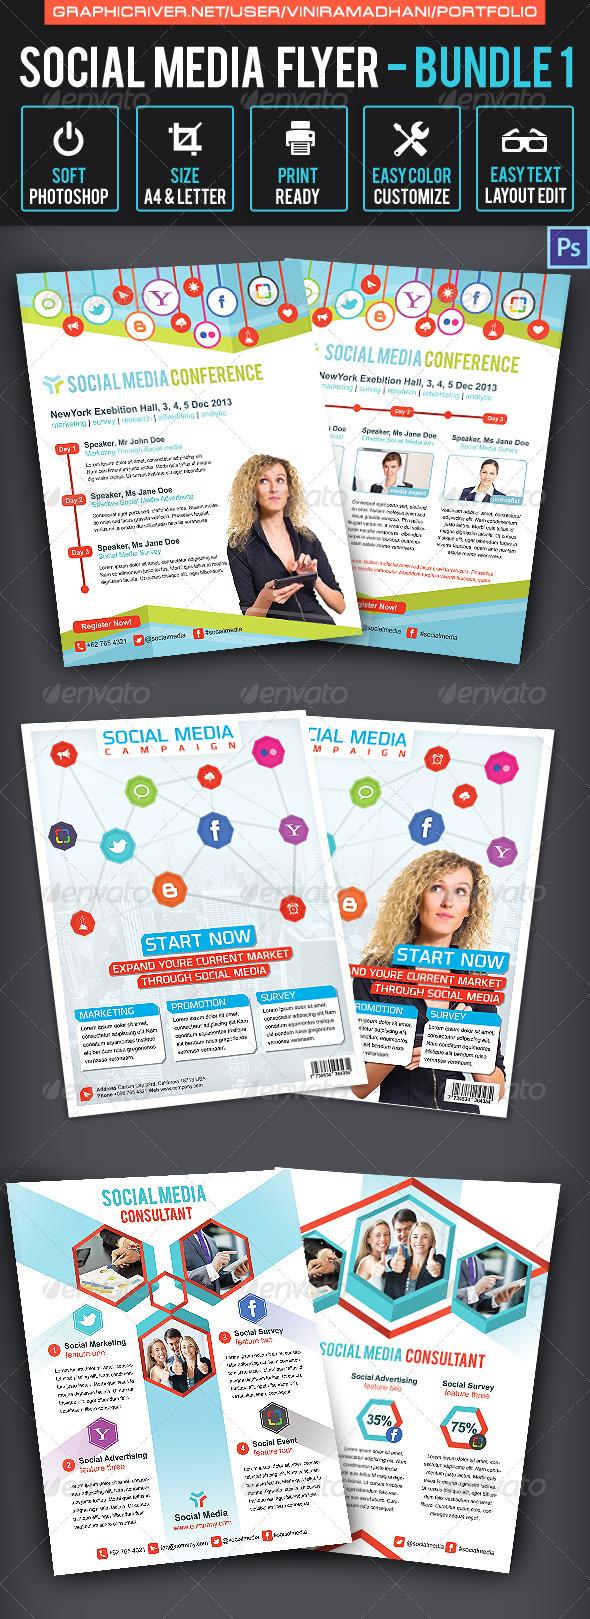 Social Media Flyer Bundle 1 - Corporate Flyers